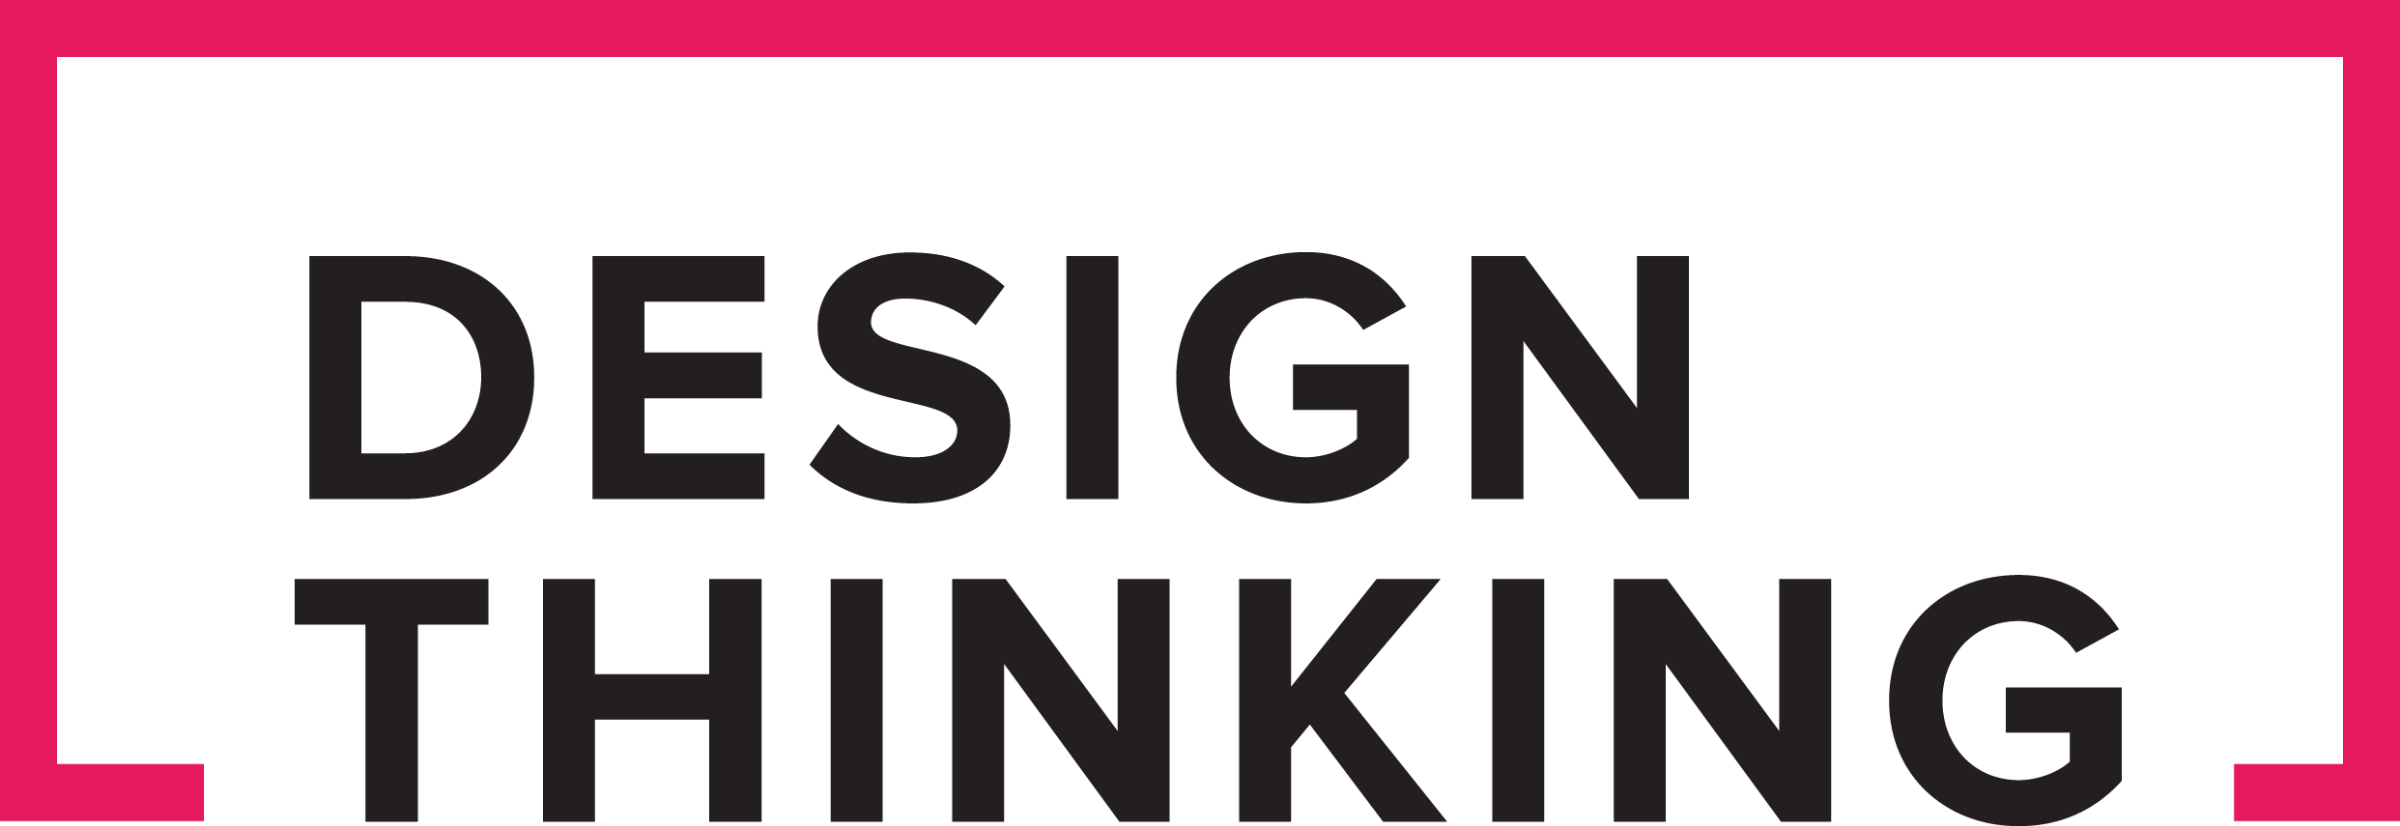 Design Thinking 2021